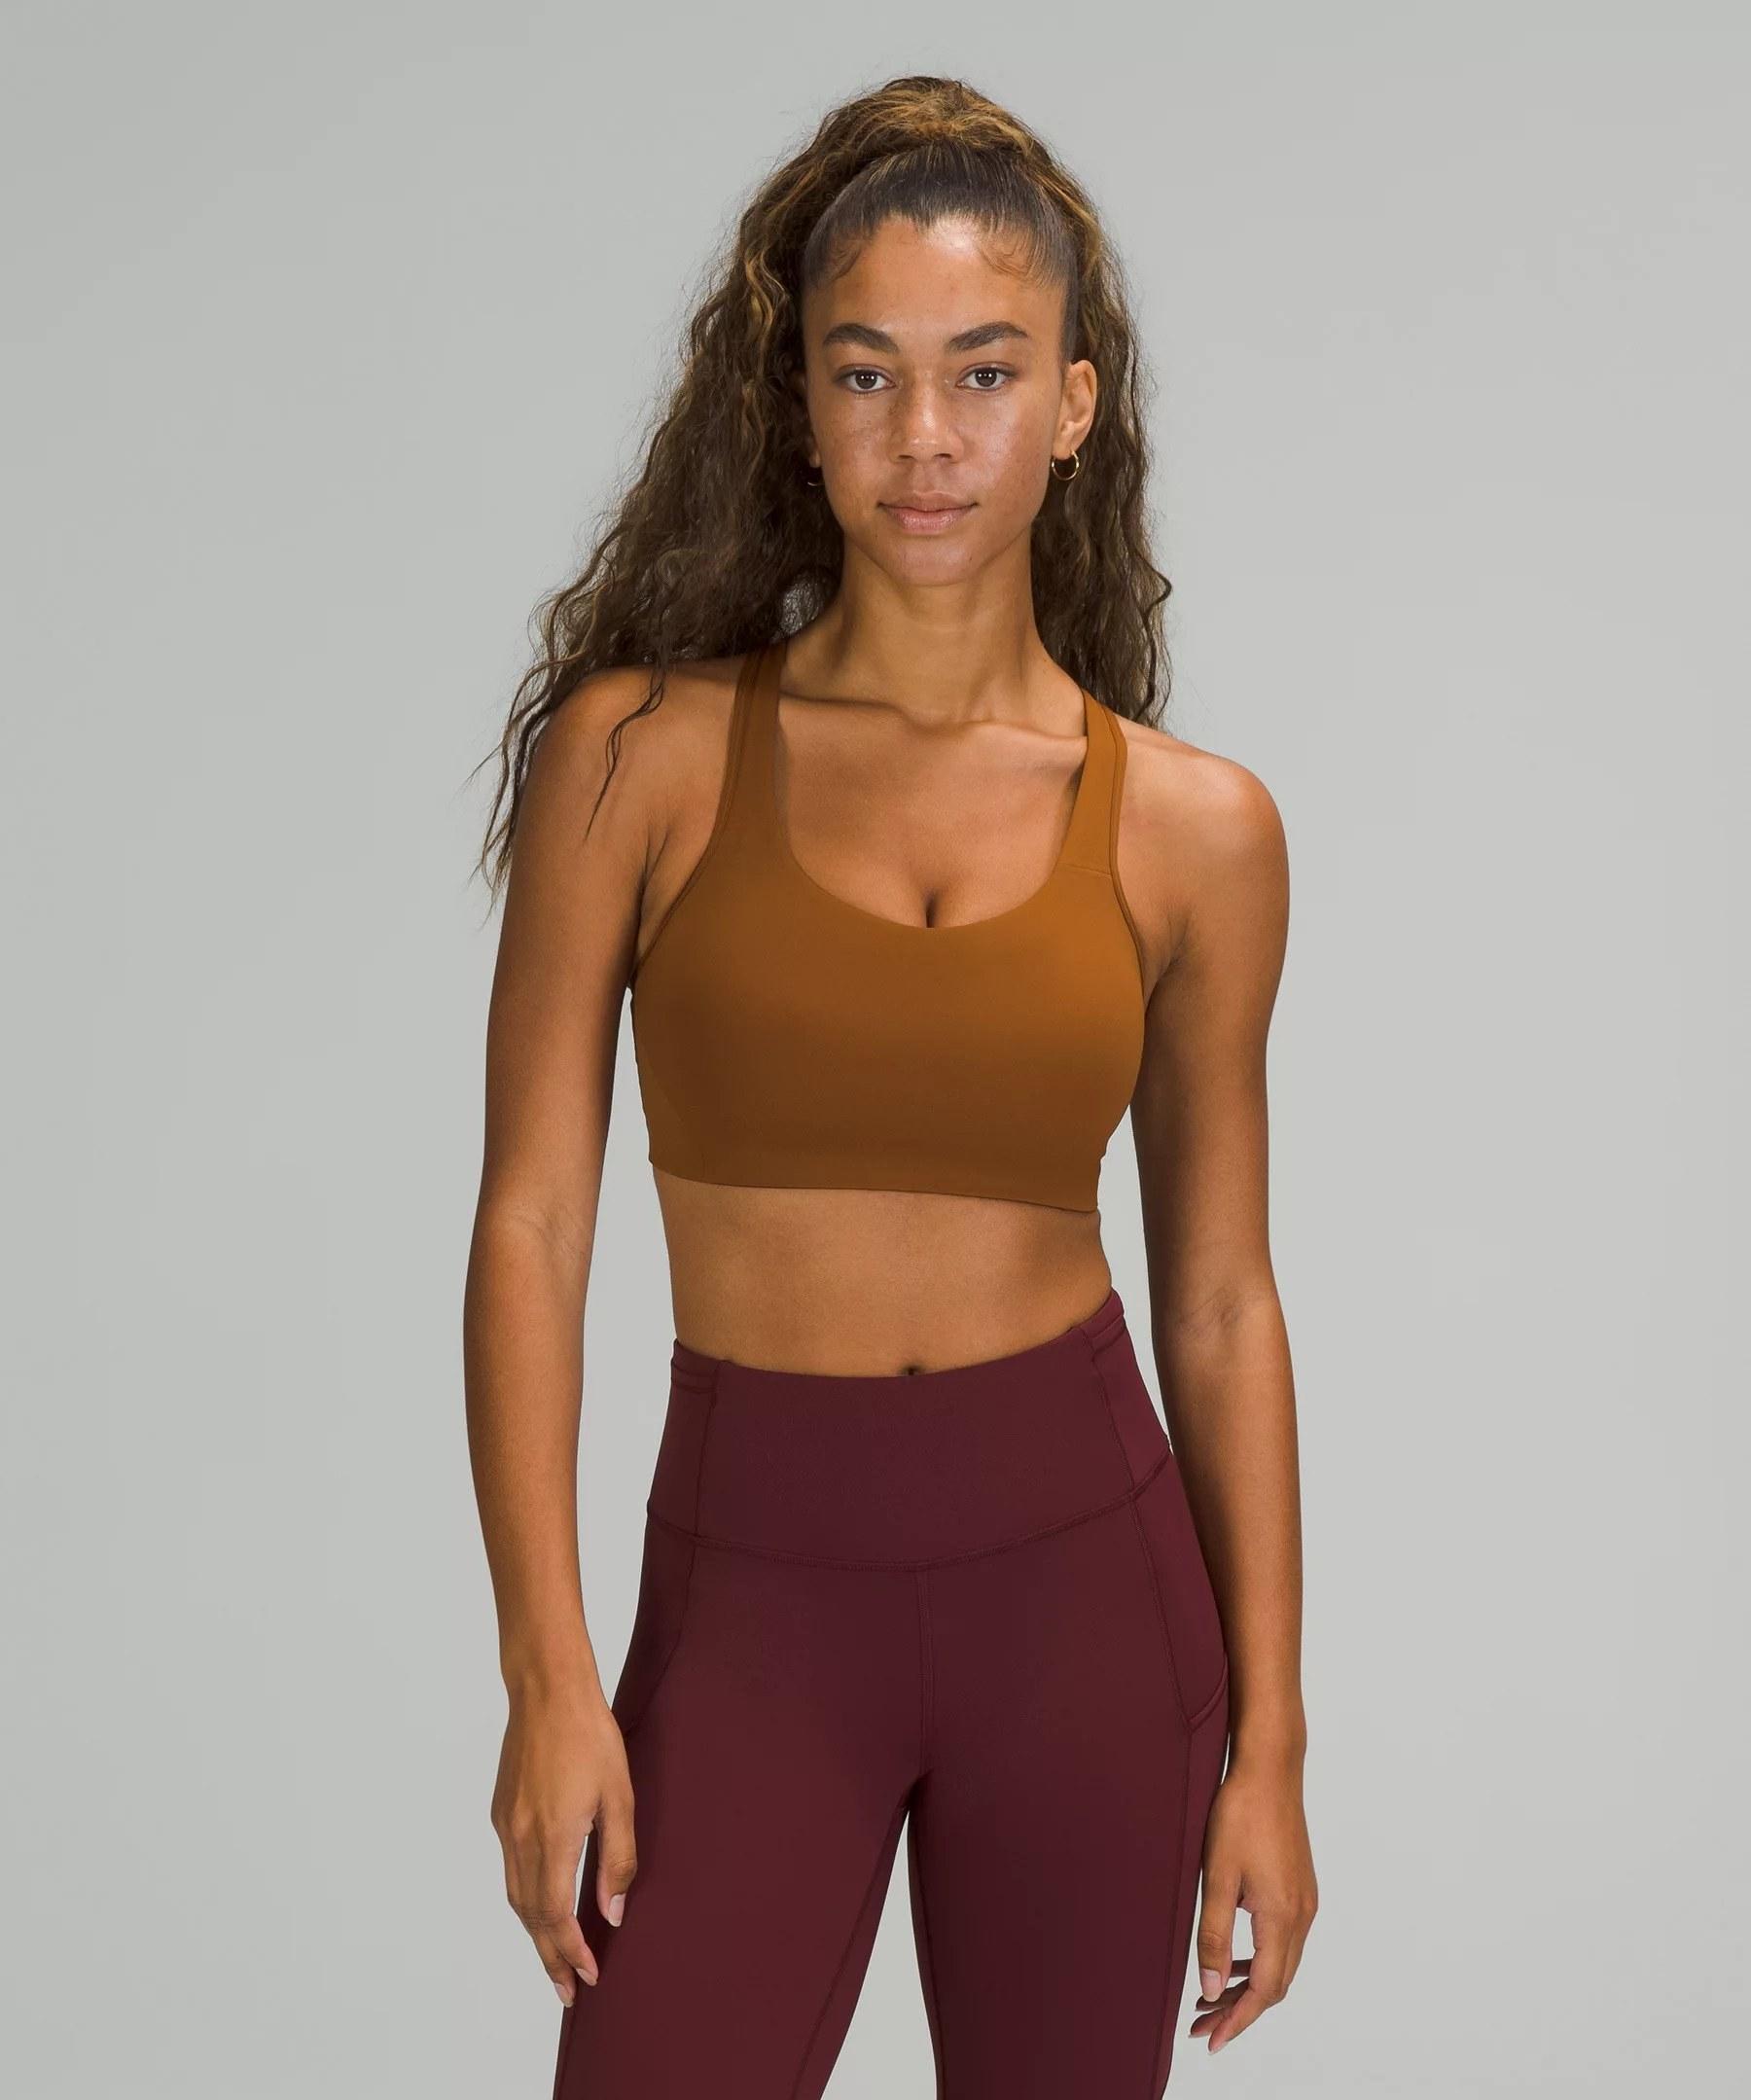 model in copper brown sports bra and berry leggings